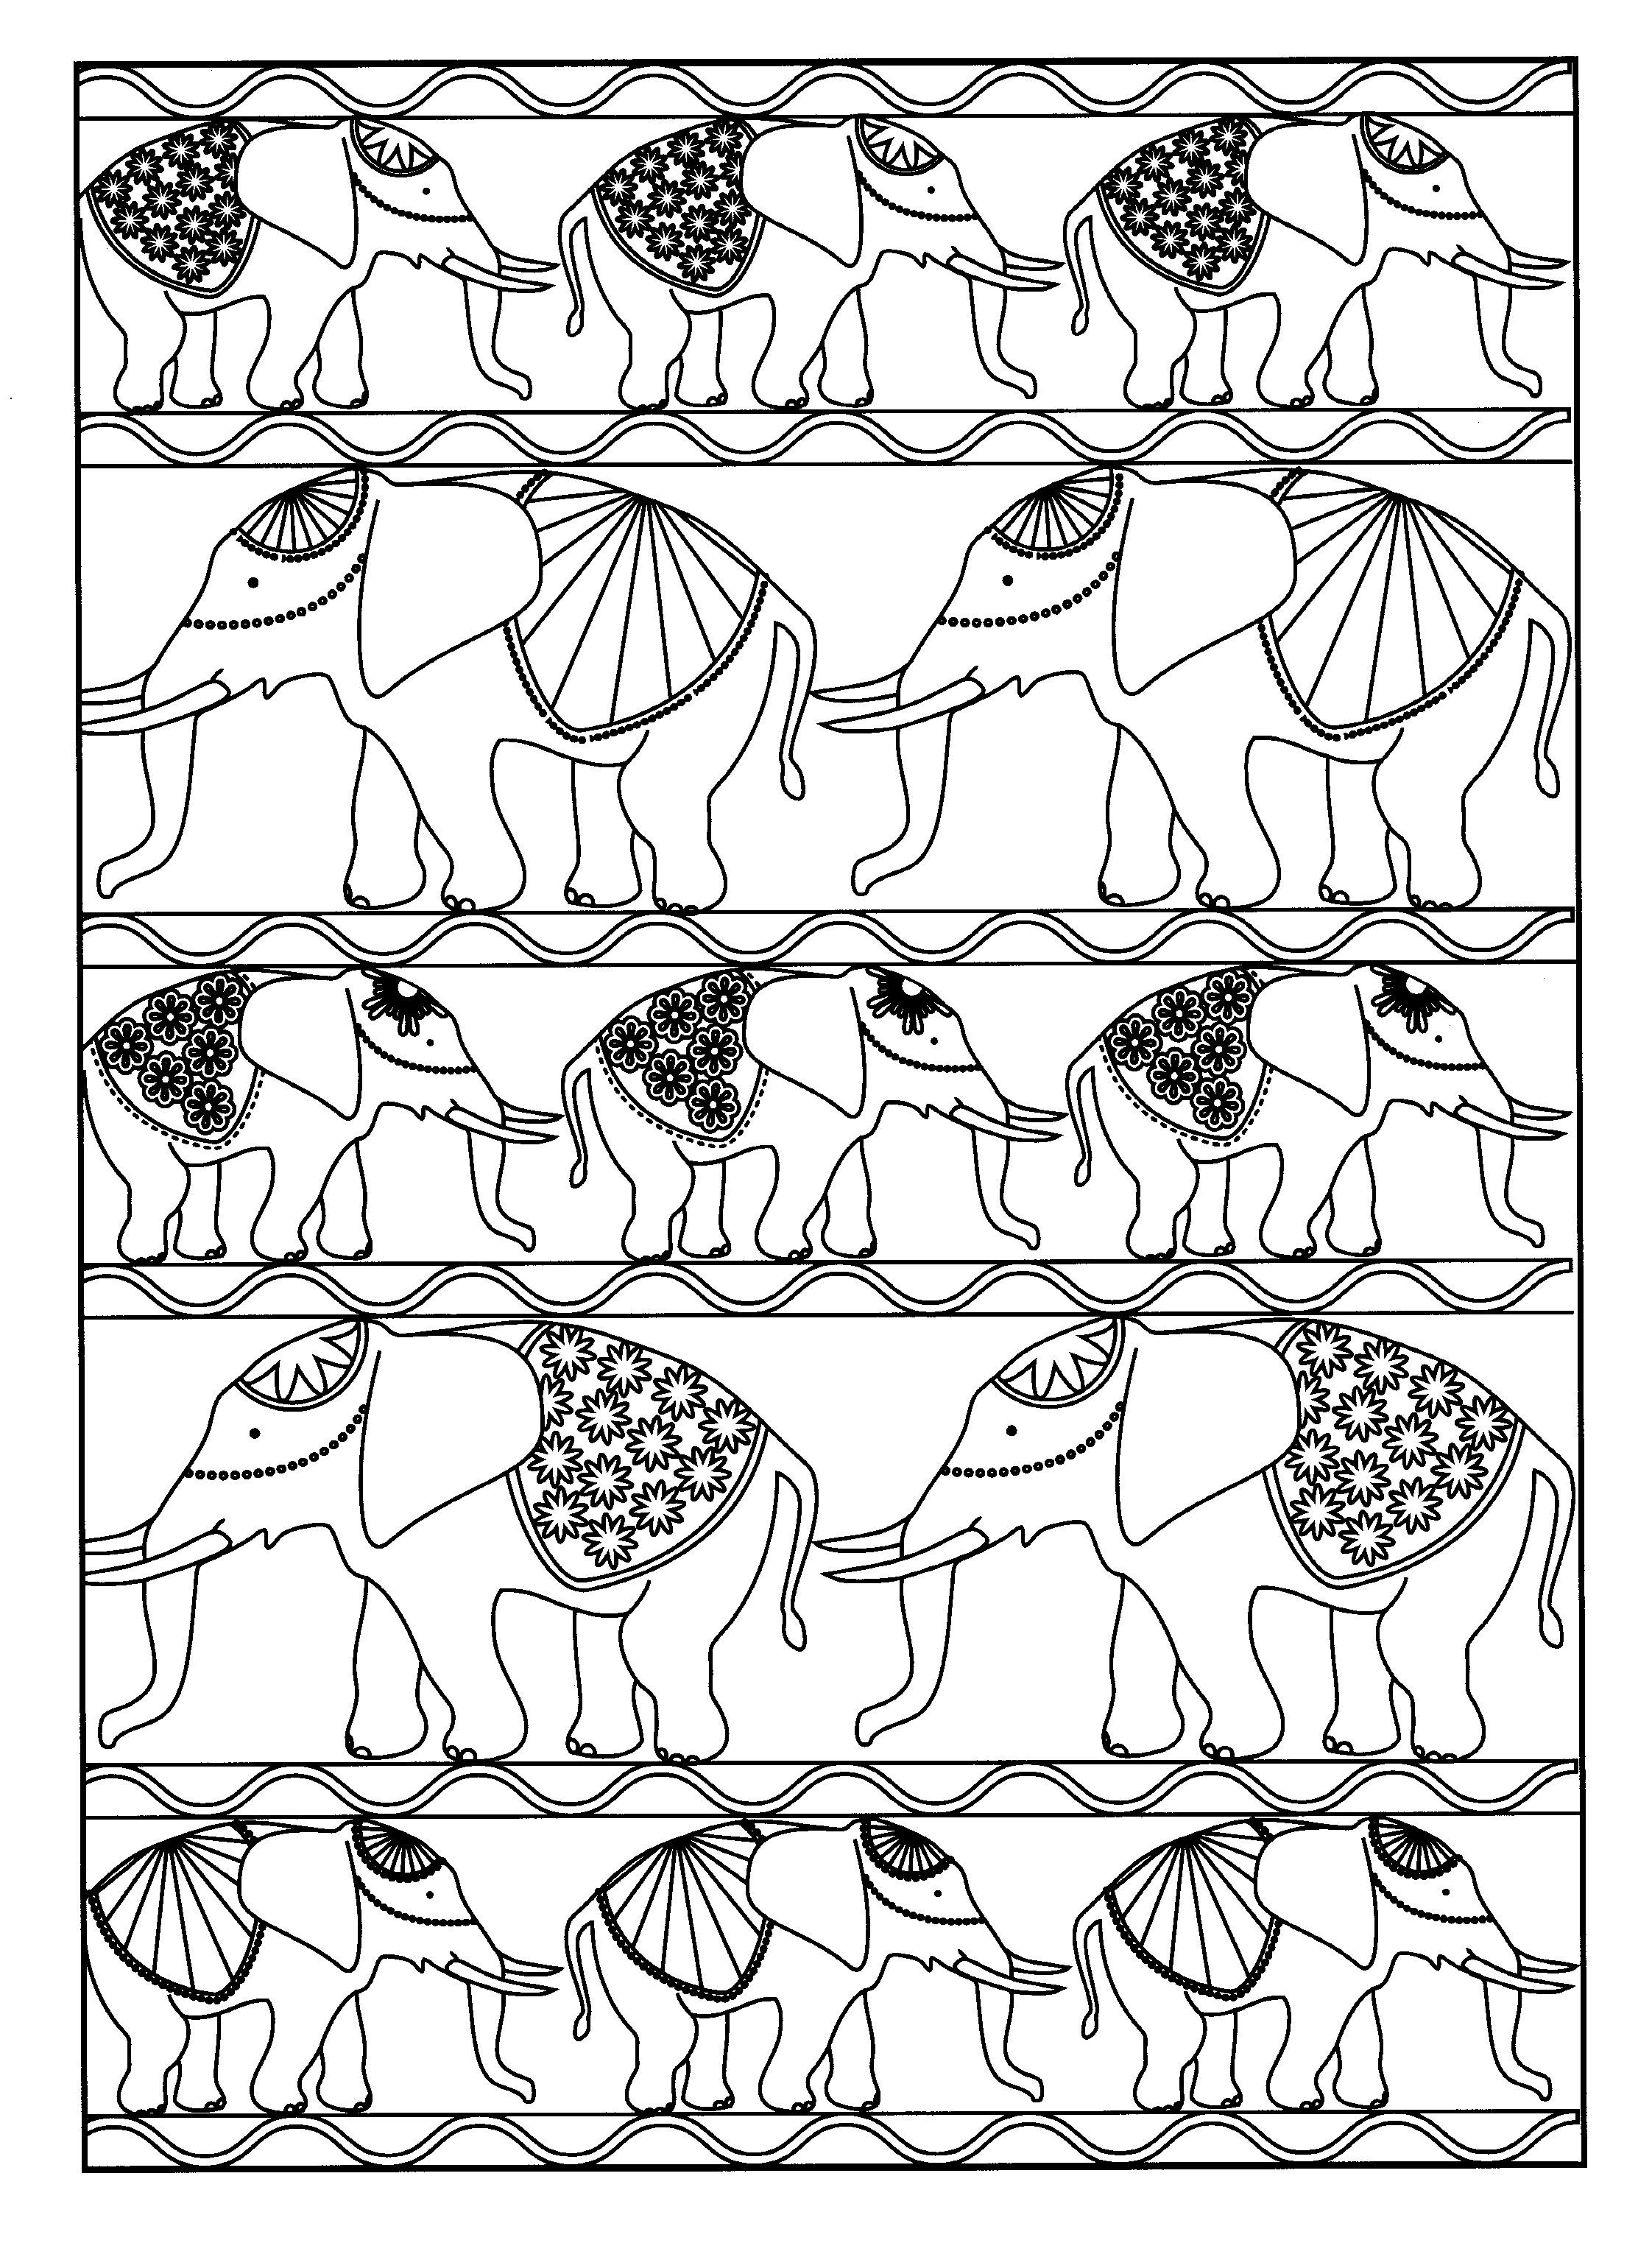 Malbuch Fur Erwachsene  : Elefanten - 6